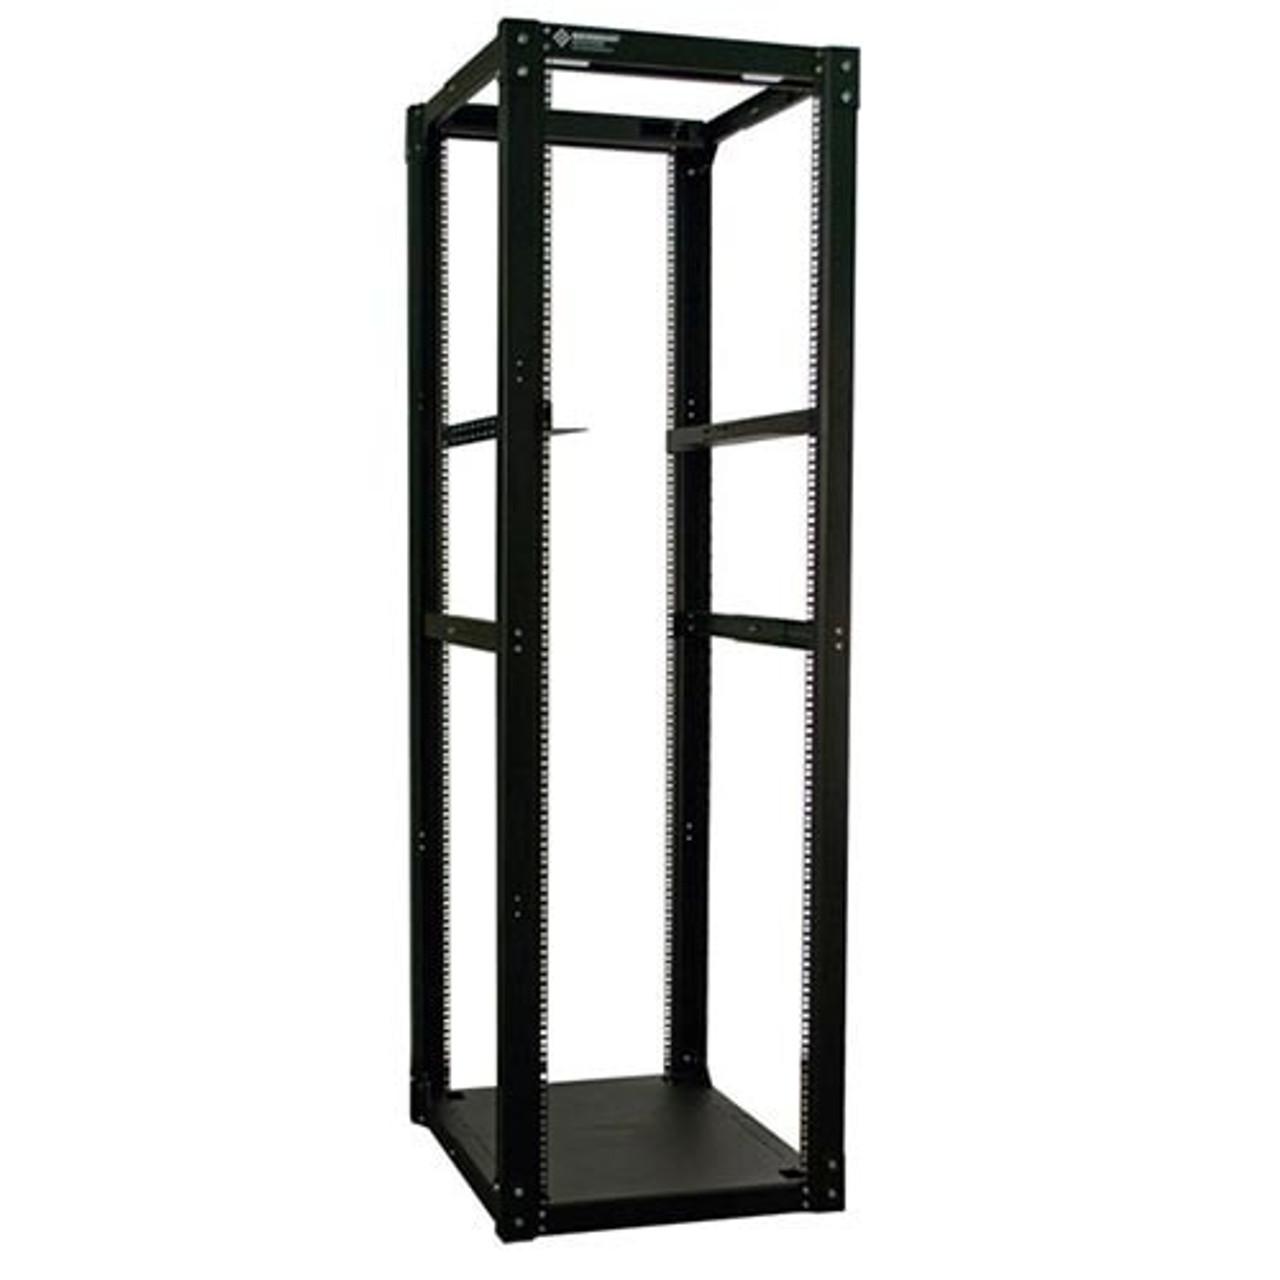 42u cruxial 4 post 19 server rack